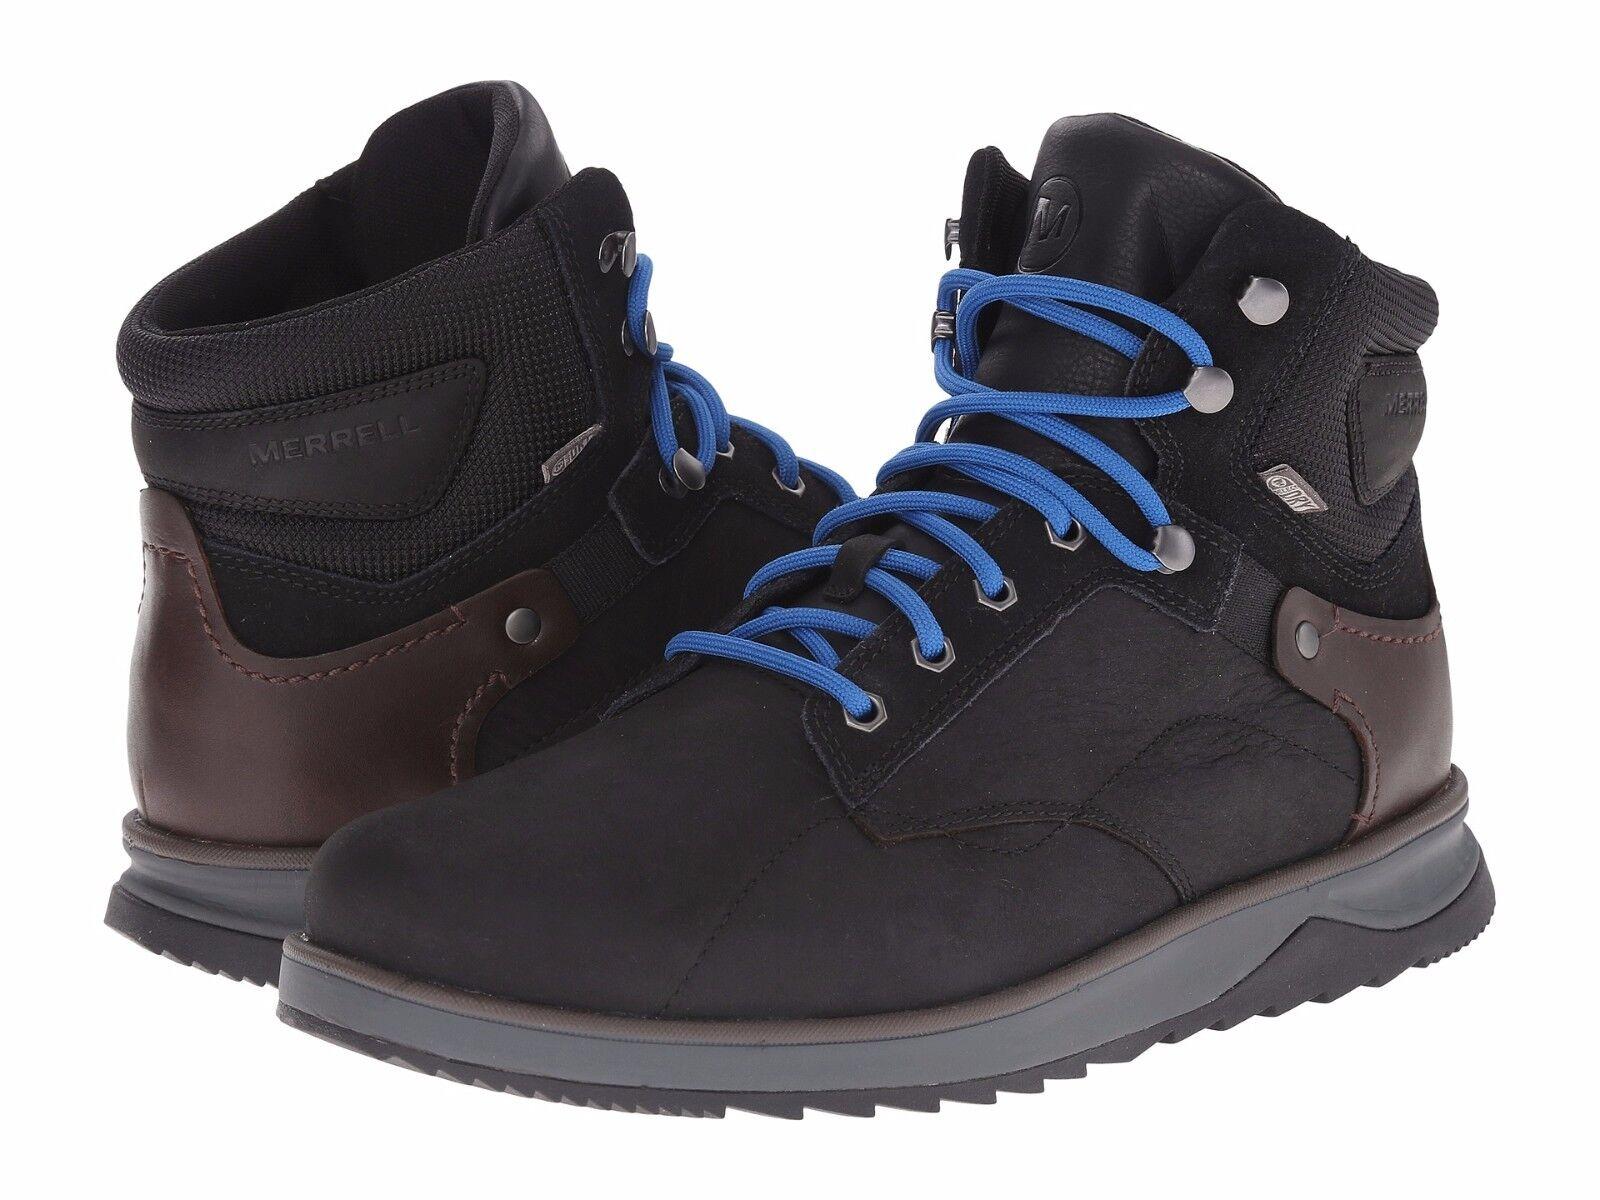 NWT Men Merrell Epiction Mid Waterproof Boot Black Leather Sneaker Size 8 - 13